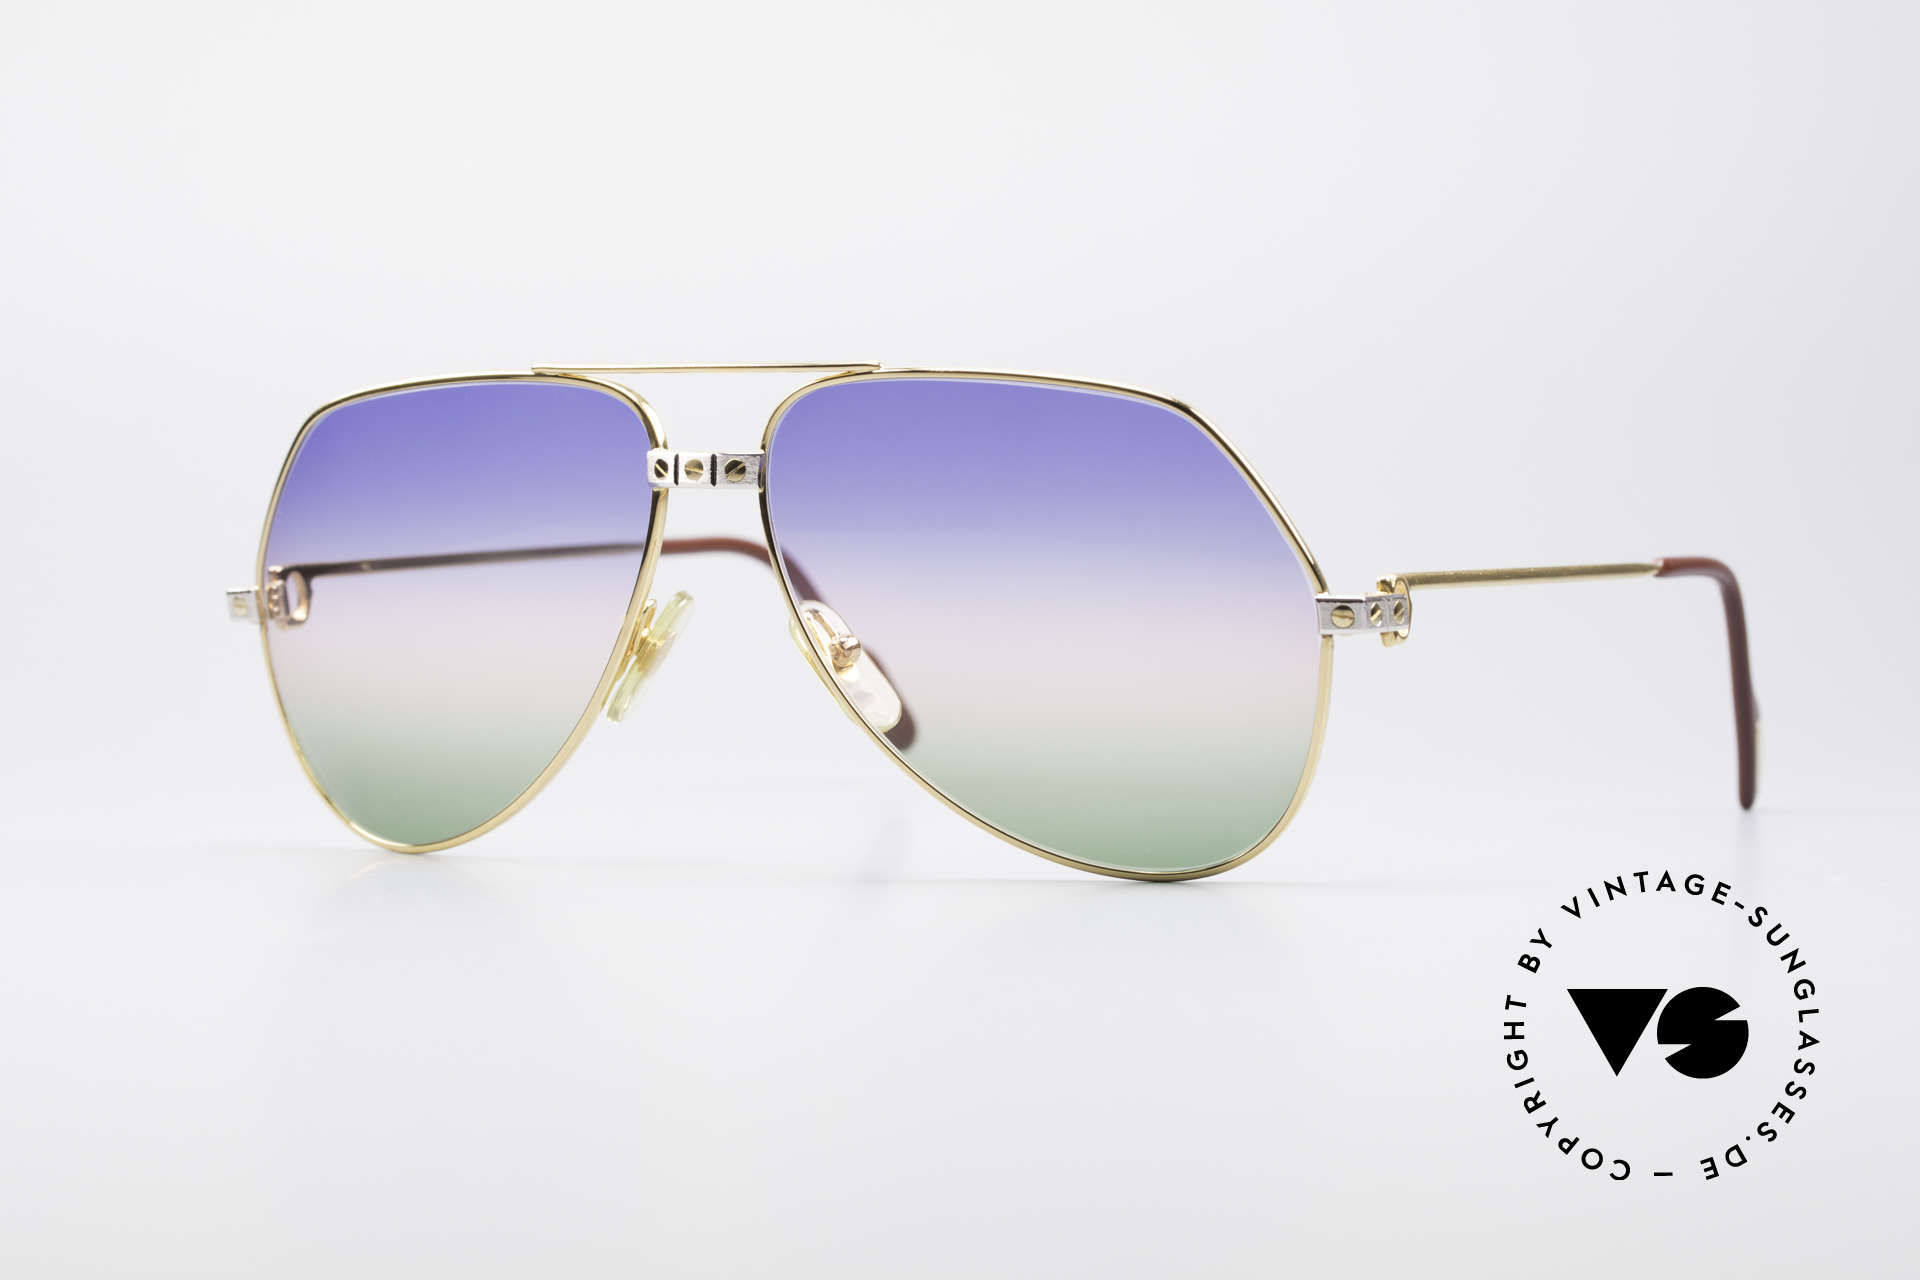 Cartier Vendome Santos - L Rare Luxury 80's Sunglasses, Vendome = the most famous eyewear design by CARTIER, Made for Men